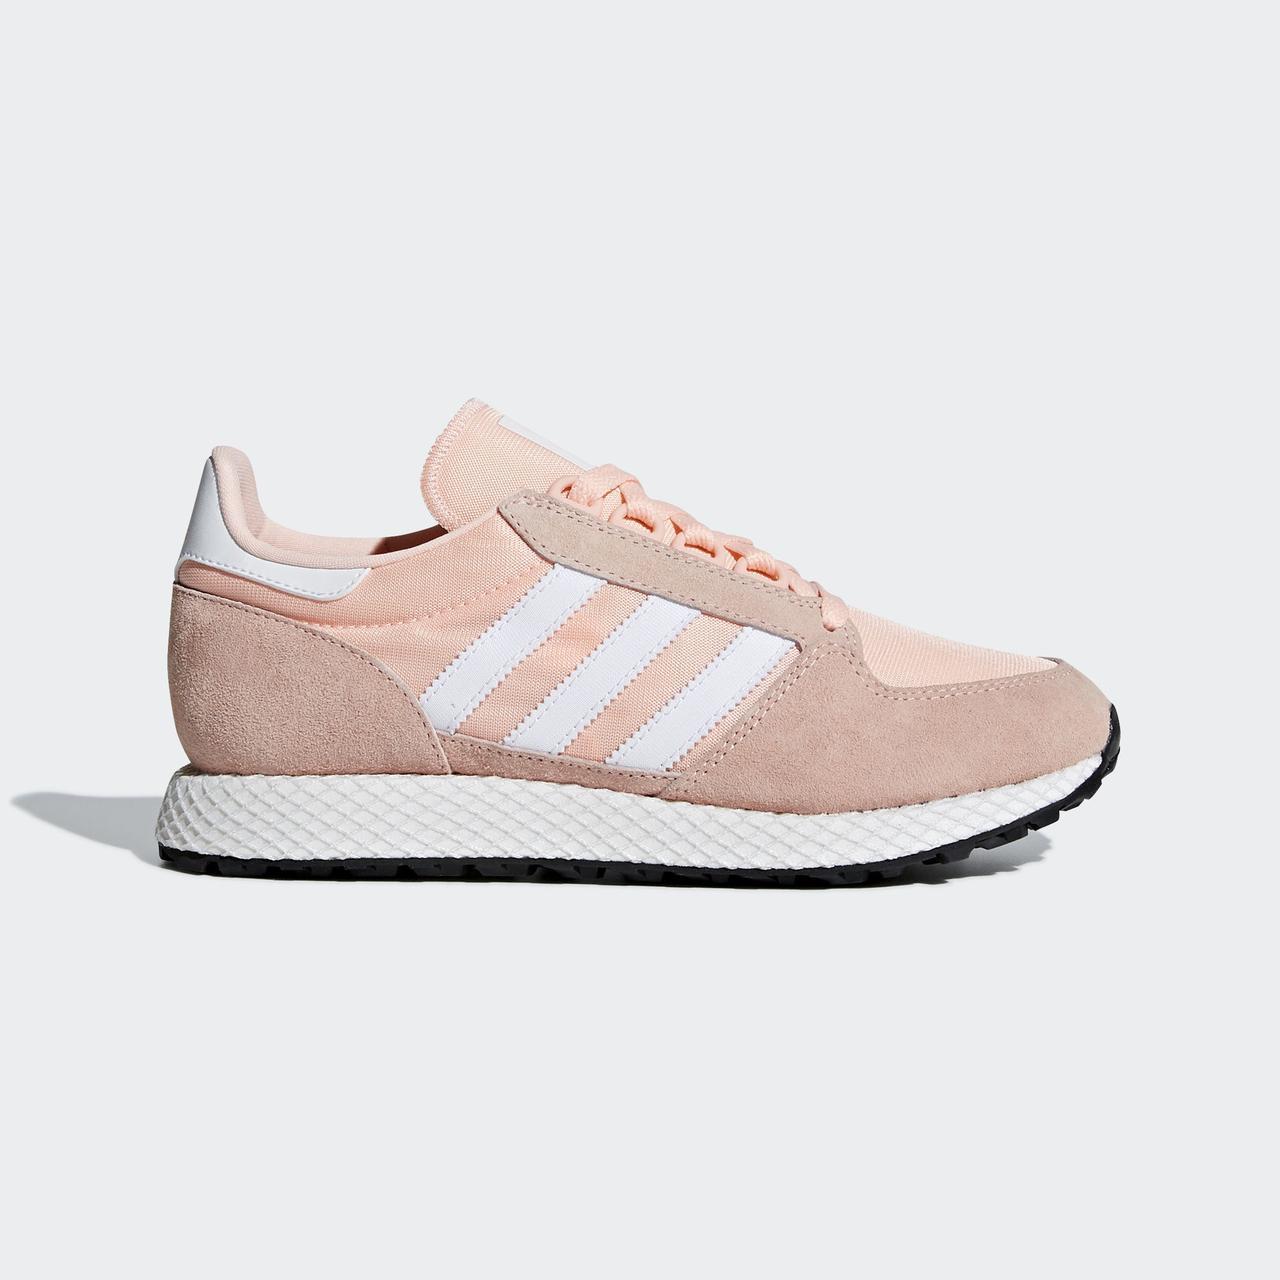 66922b4324b1 Купить Женские кроссовки Adidas Originals Forest Grove (Артикул ...